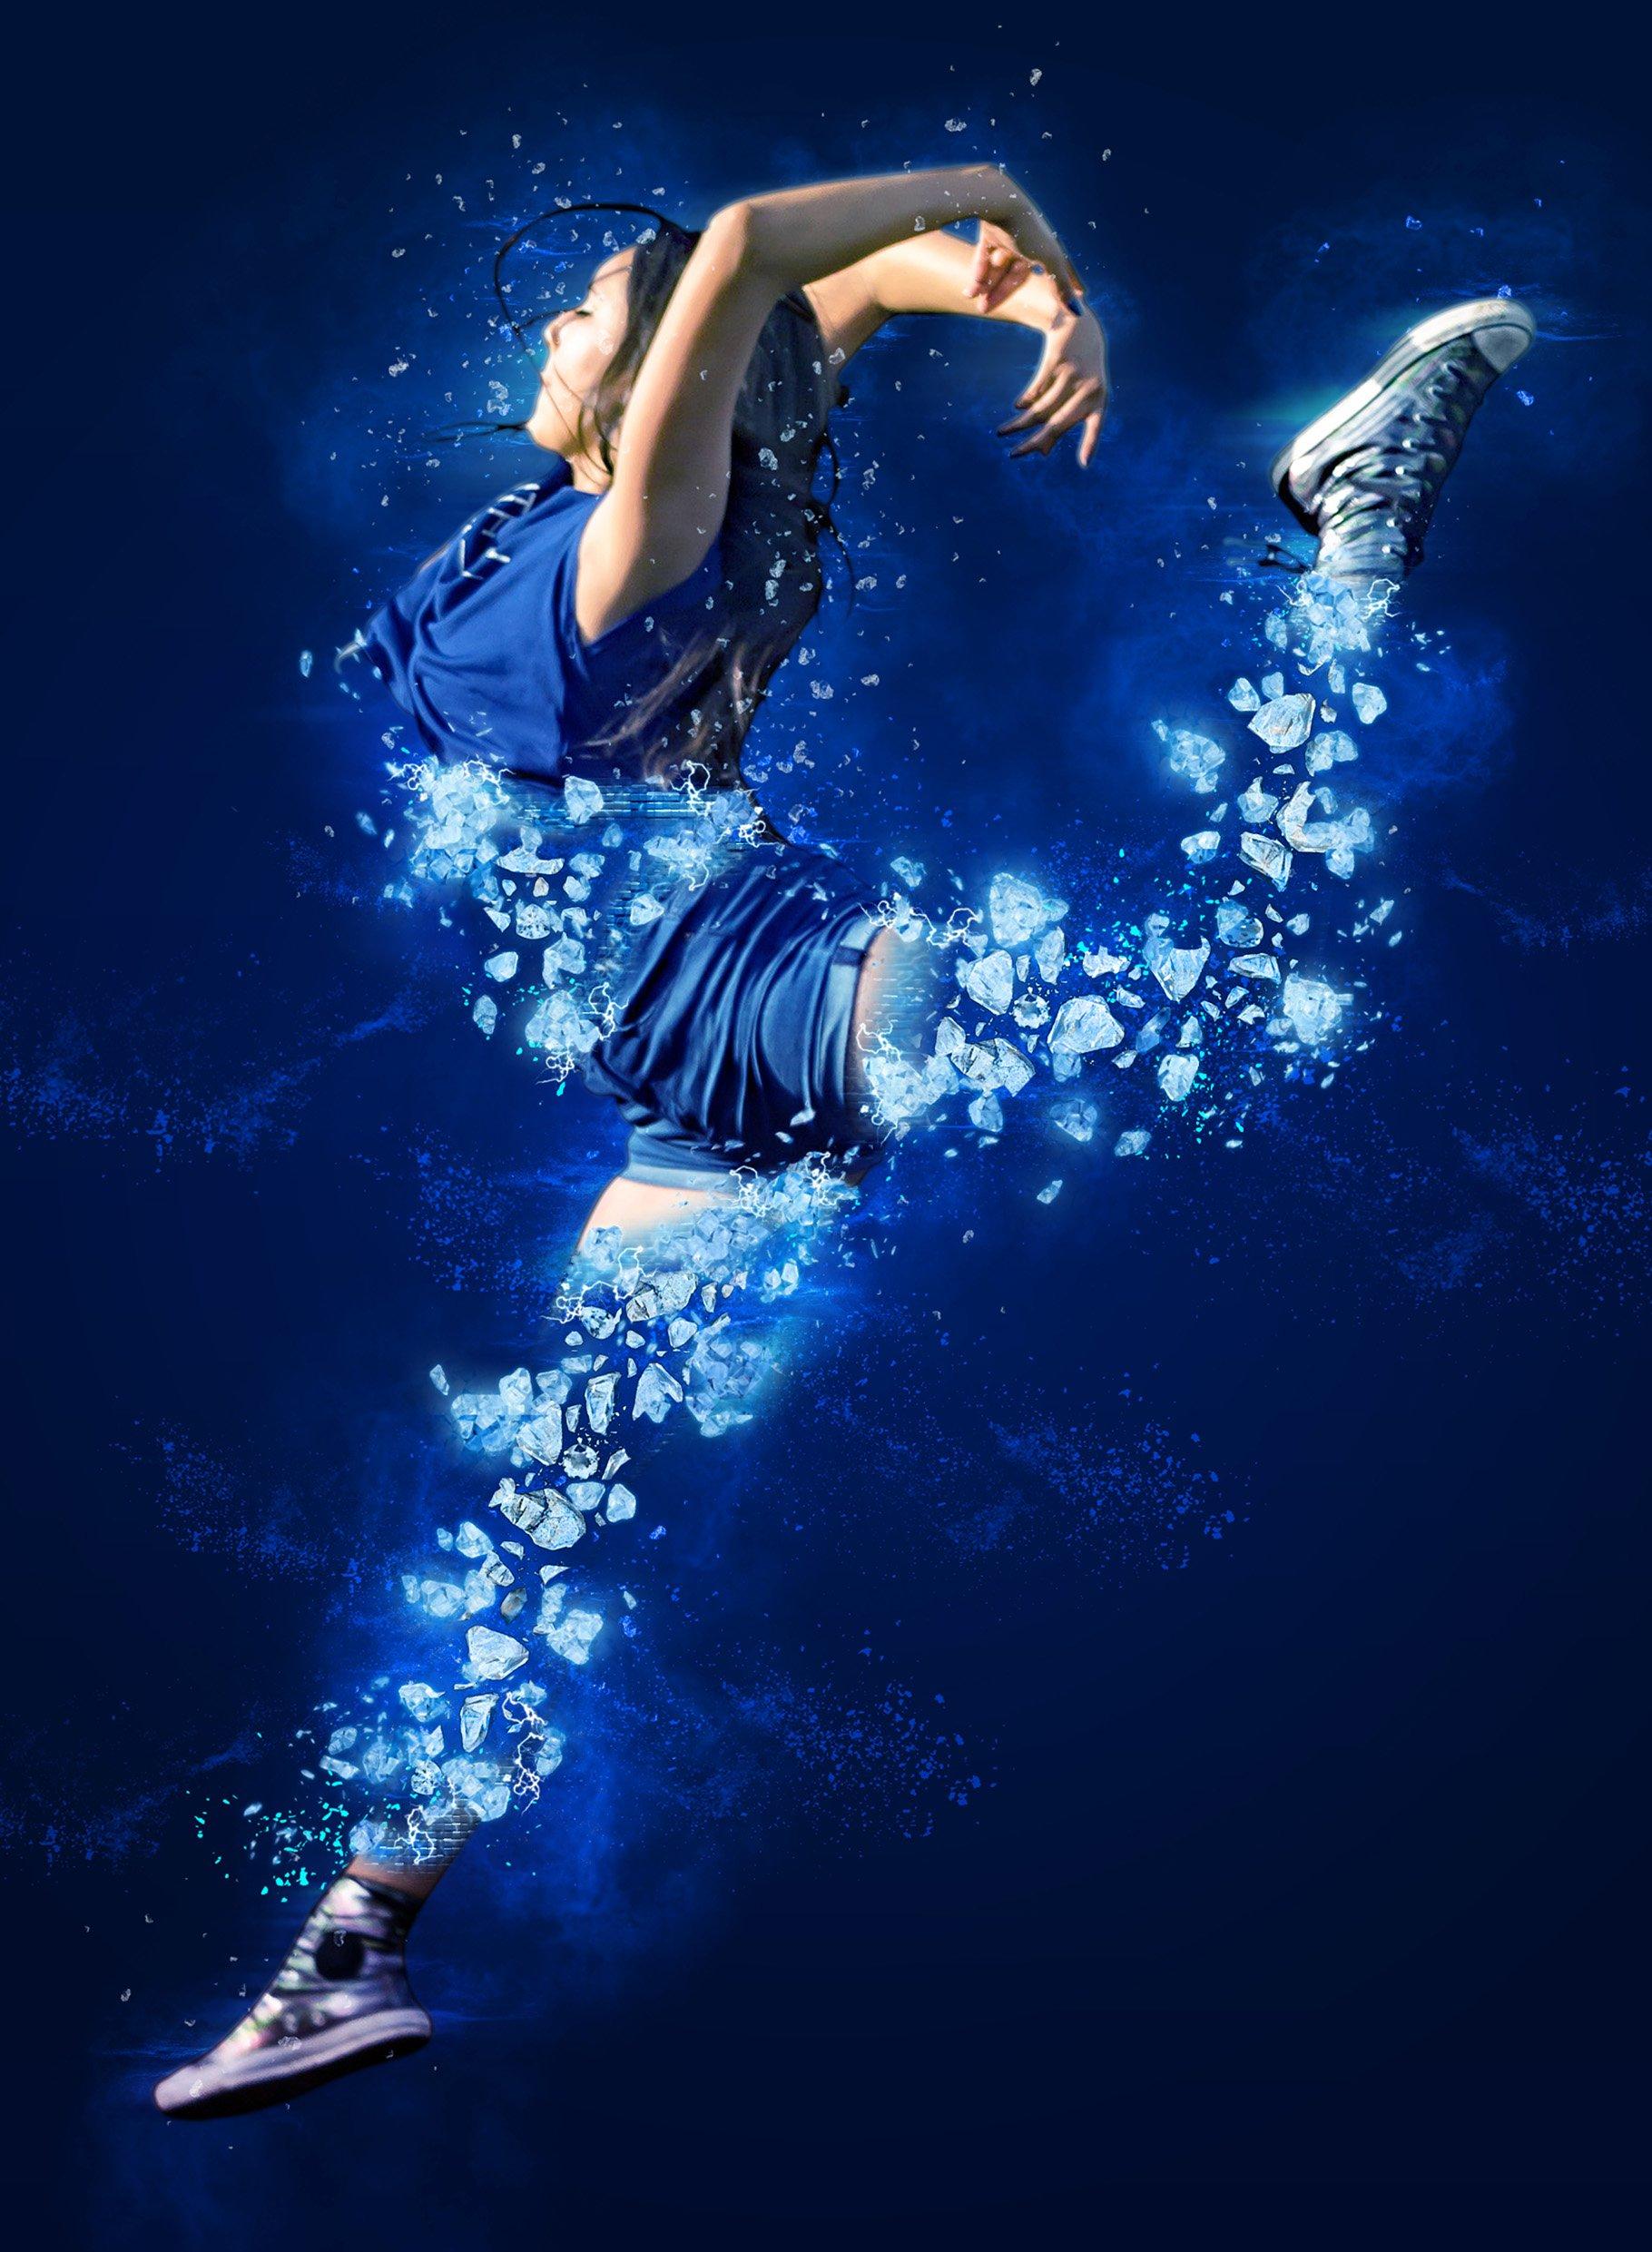 Icarus 2